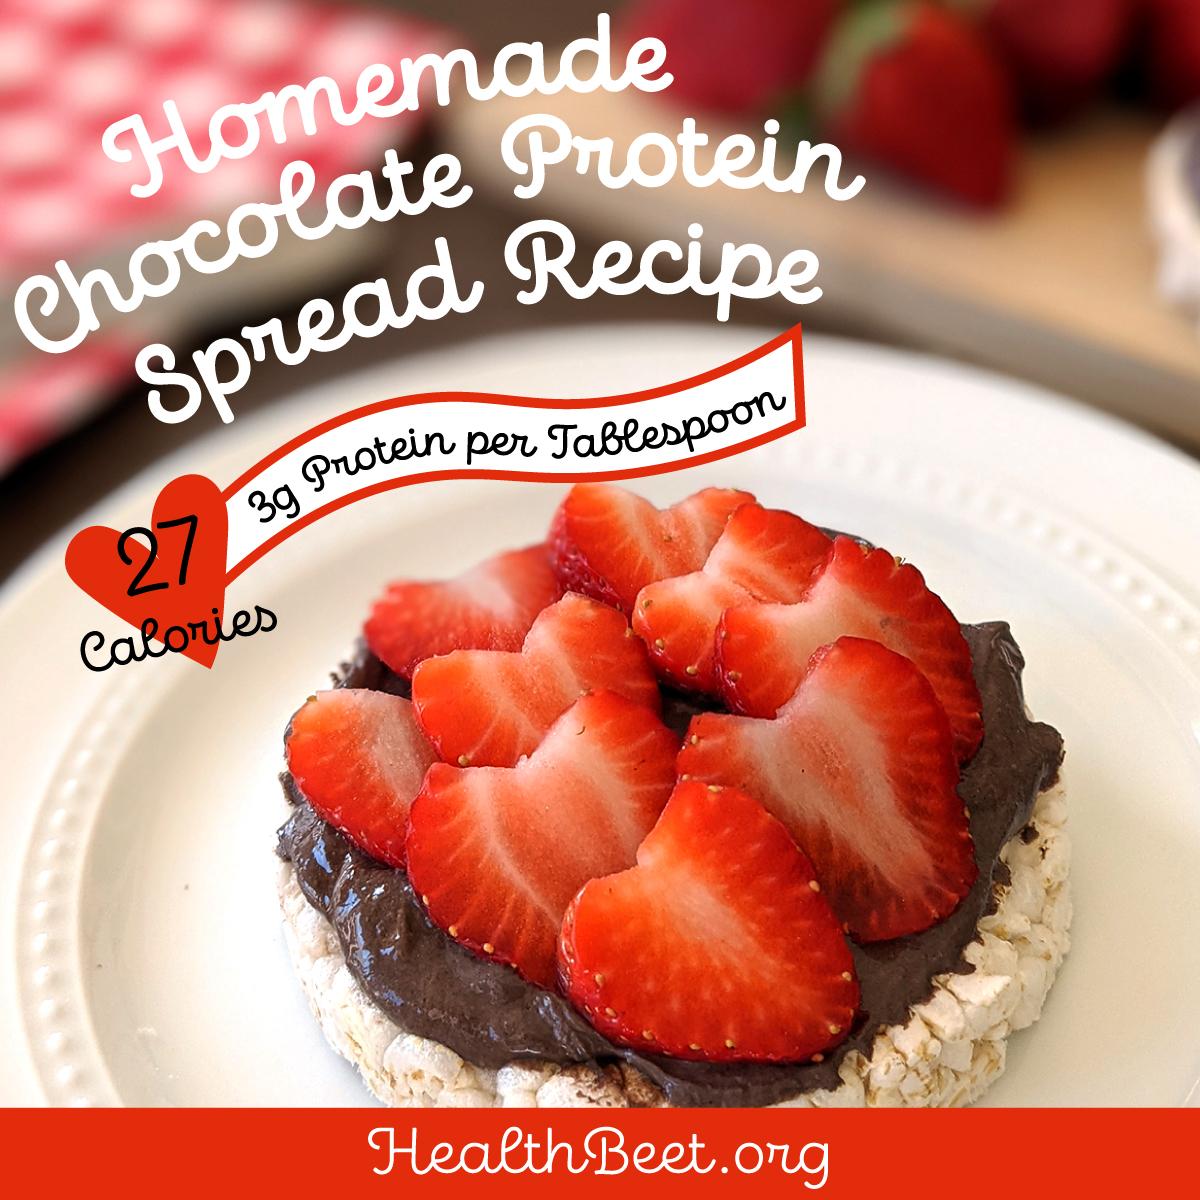 Chocolate Spread Heart Thumb Eldwin Script Font 1200x1200